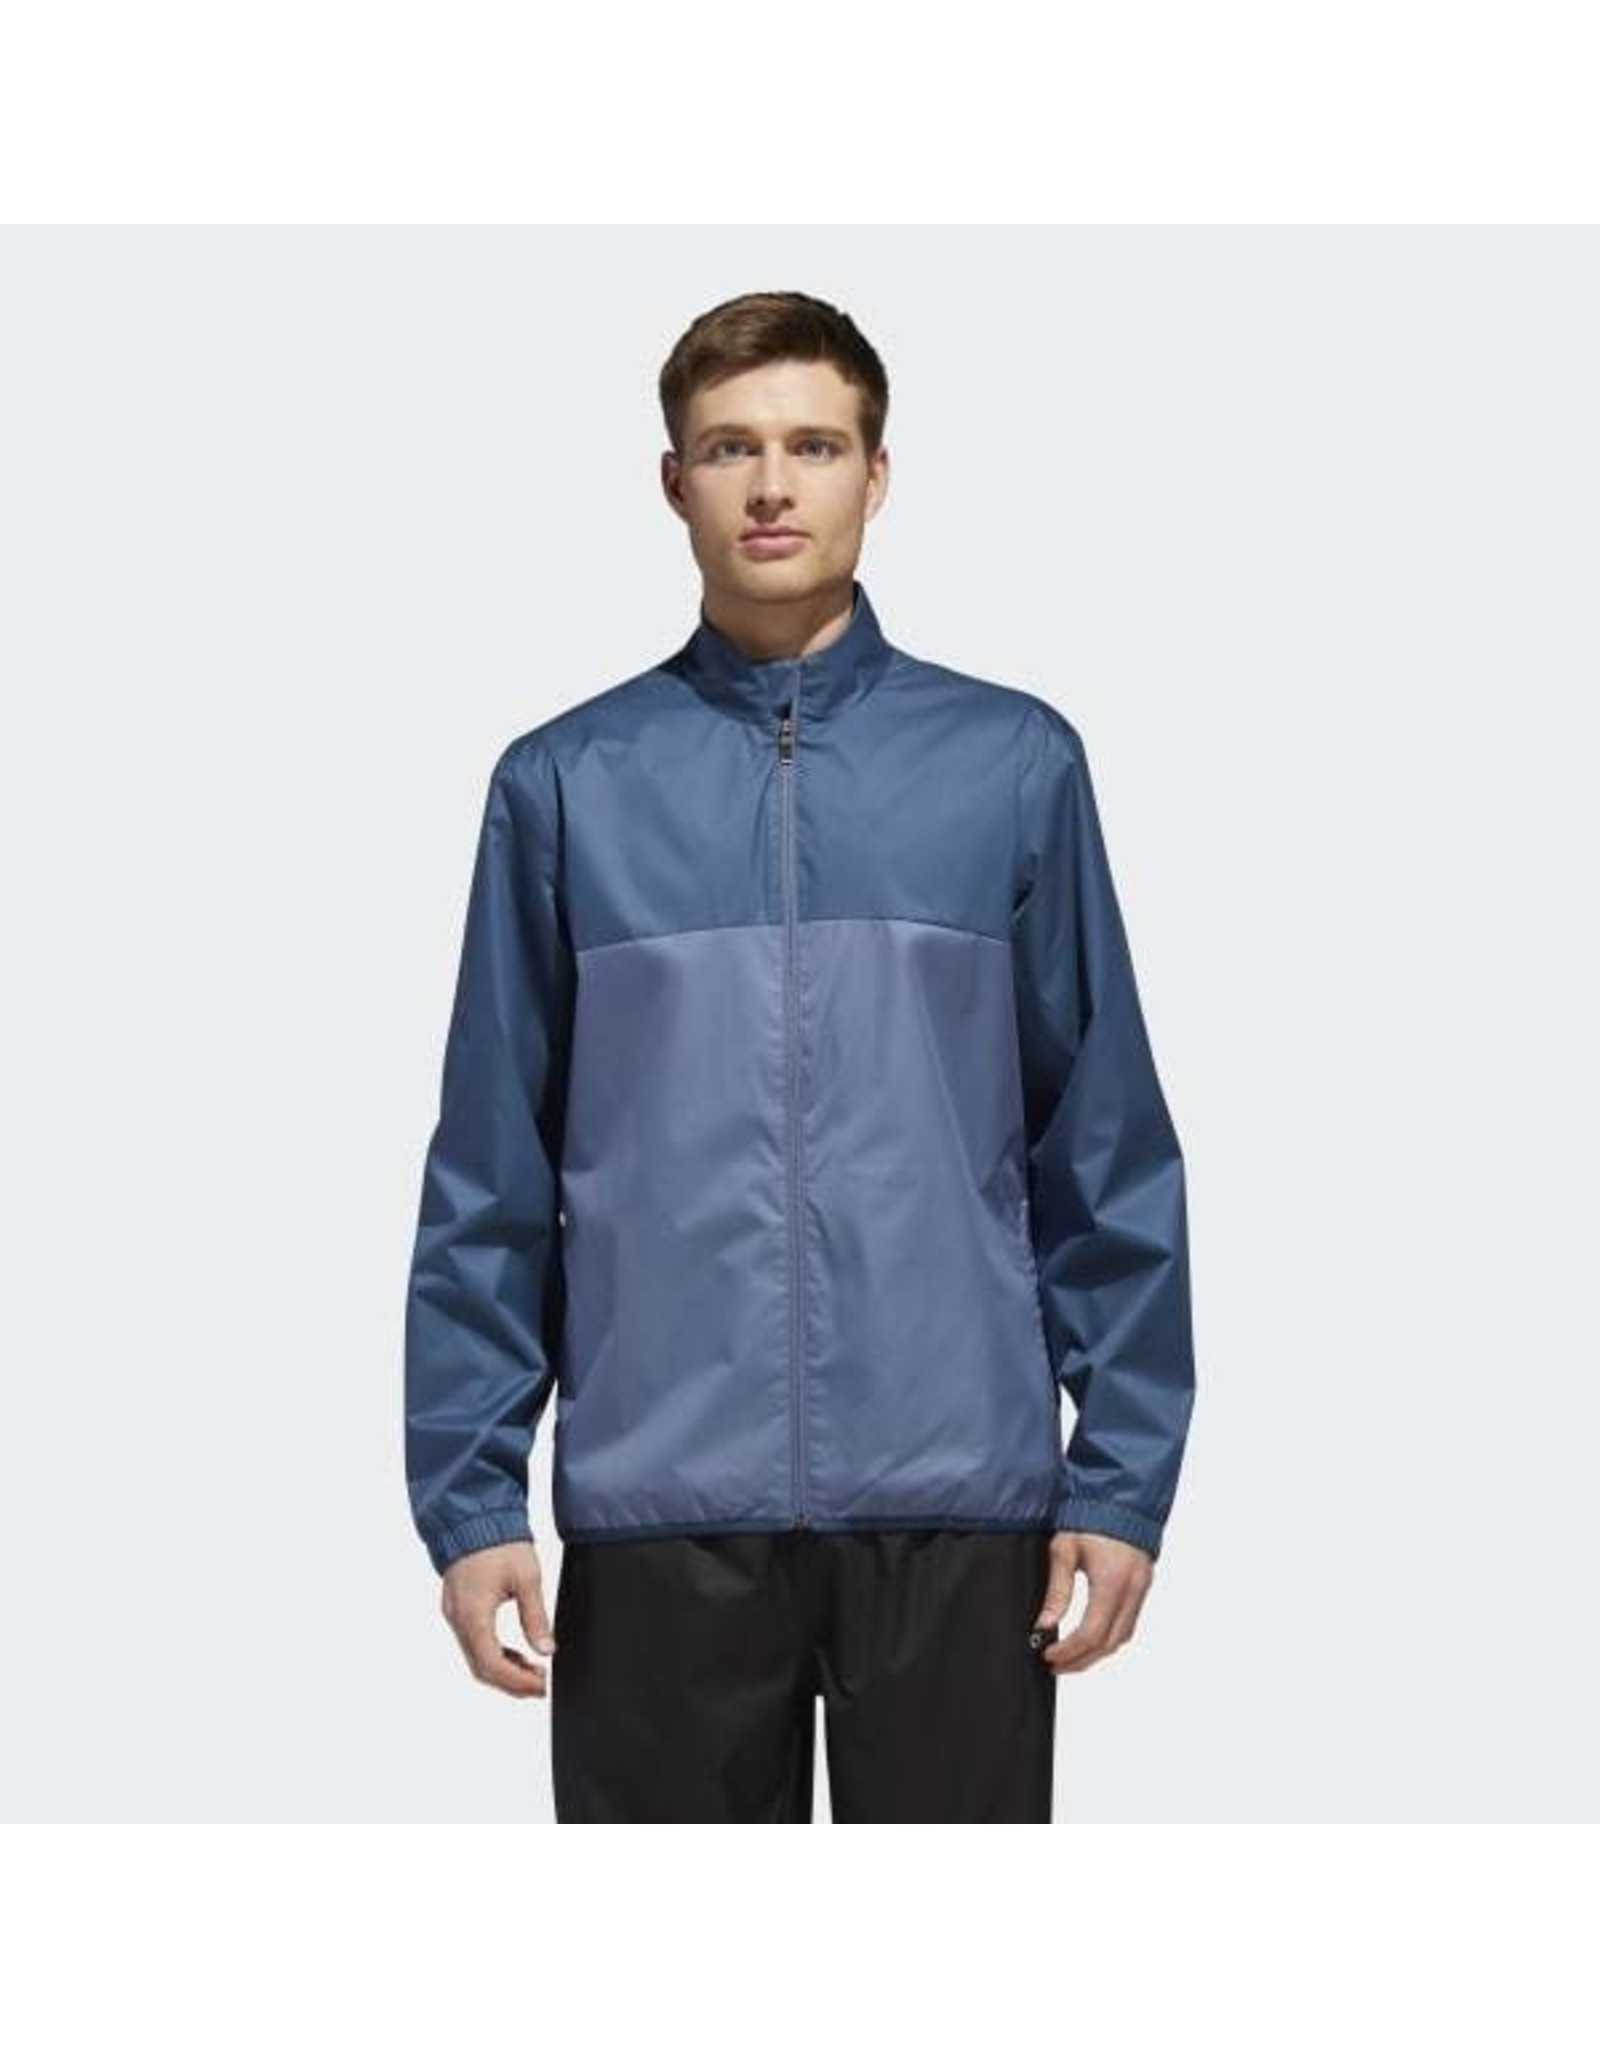 Adidas Jacket Adi ProV1